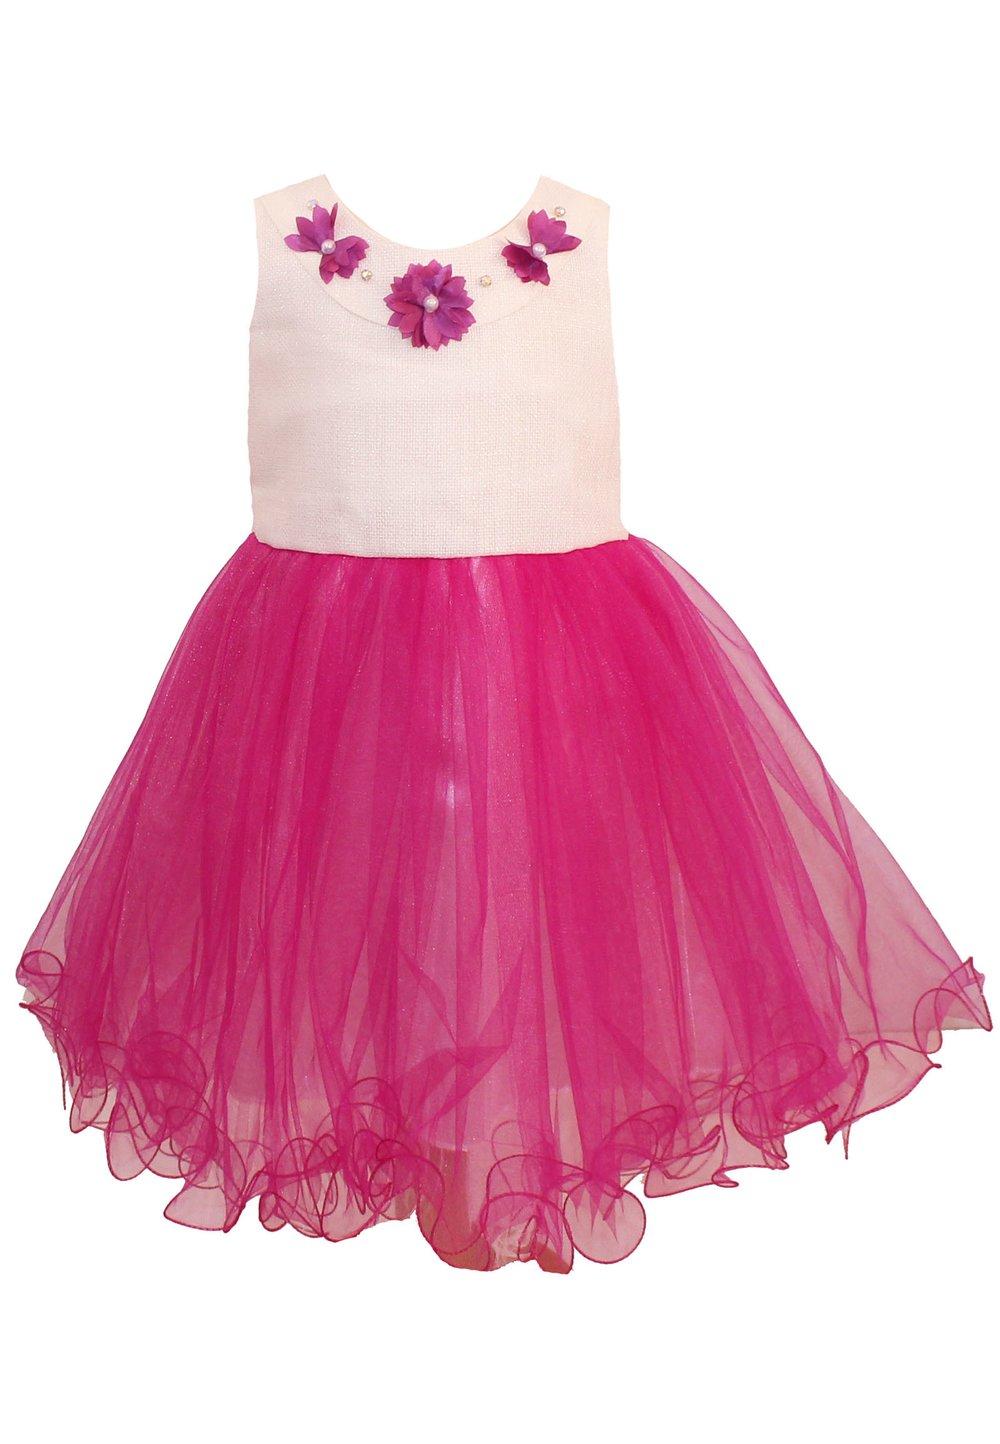 Rochita, cu floricele roz imagine